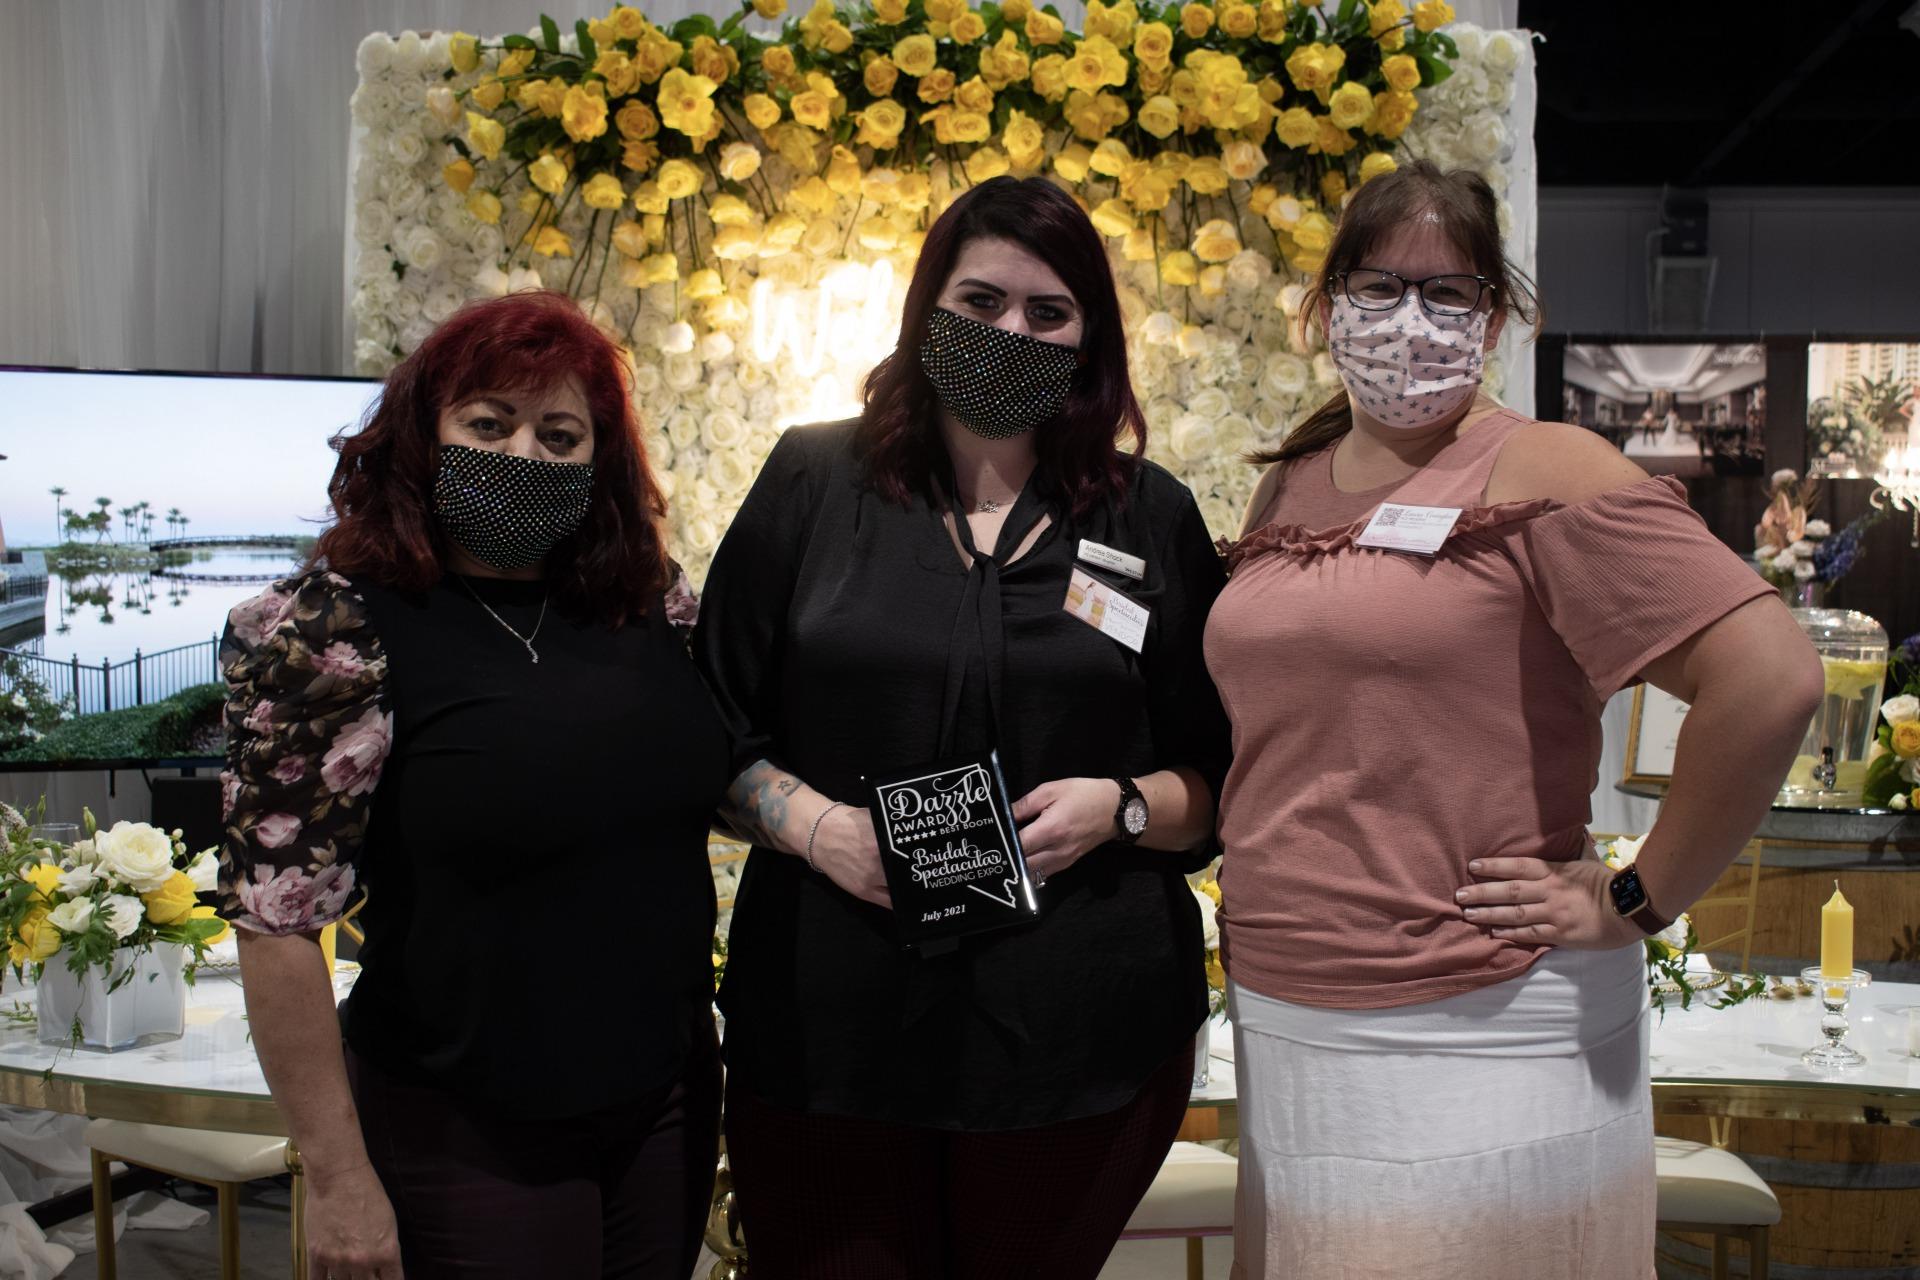 Westin Lake Las Vegas receives dazzle award at Las Vegas bridal show Bridal Spectacular